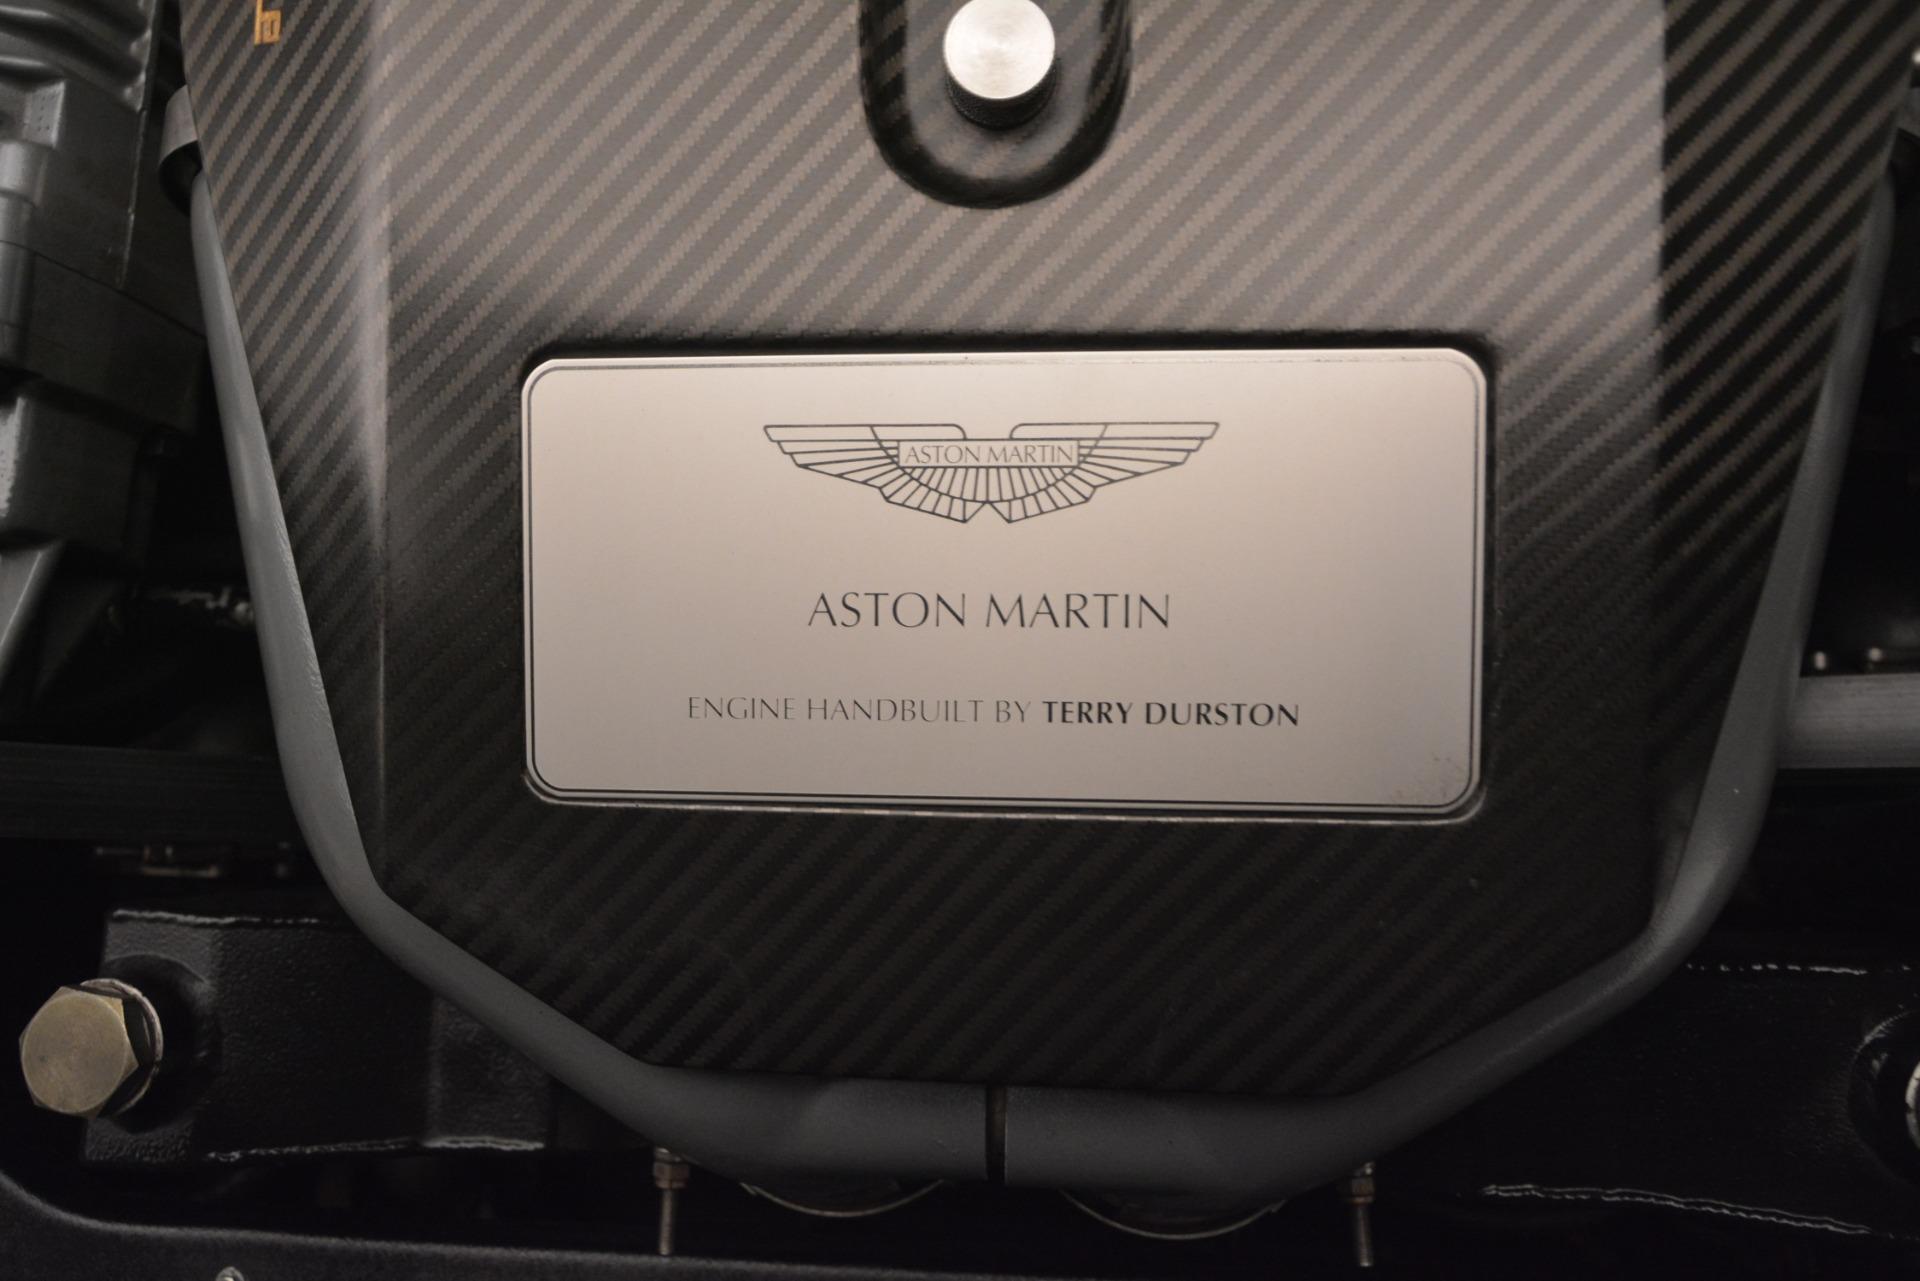 Used 1999 Aston Martin V8 Vantage Le Mans V600 Coupe For Sale In Westport, CT 2789_p31